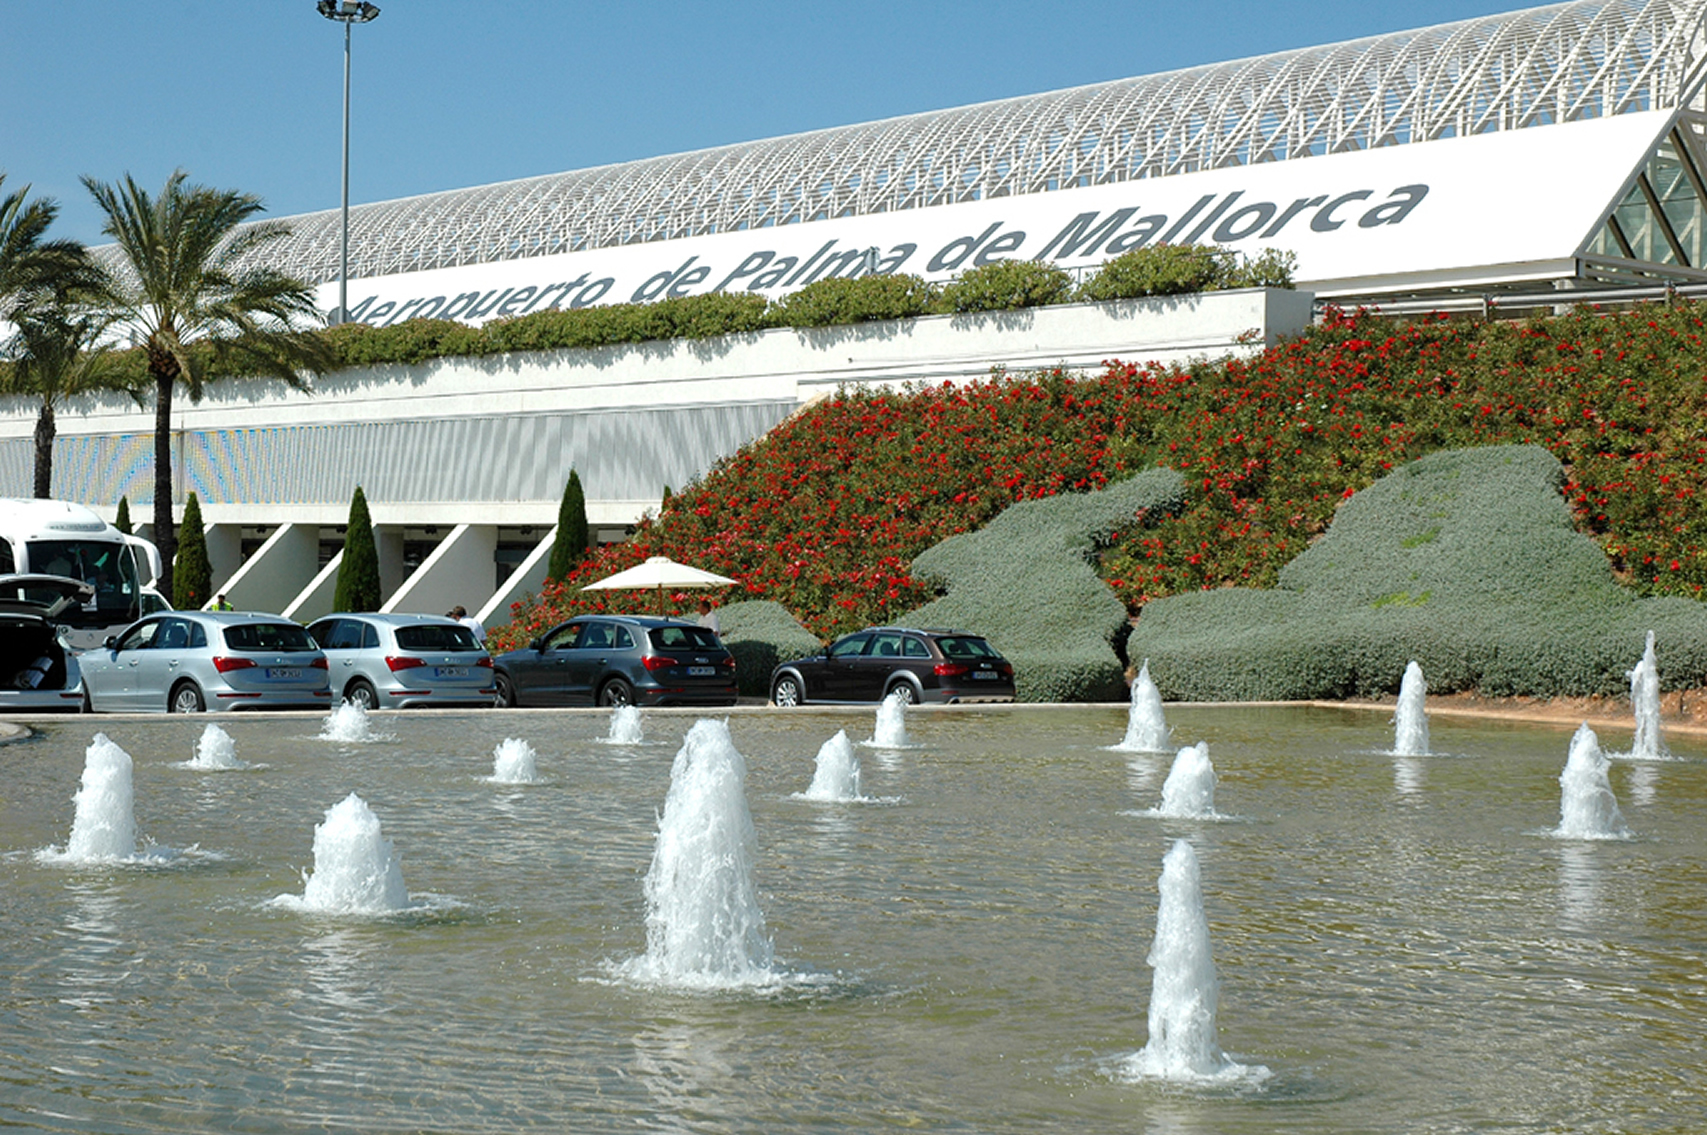 Gratis WIFI am Airport Palma